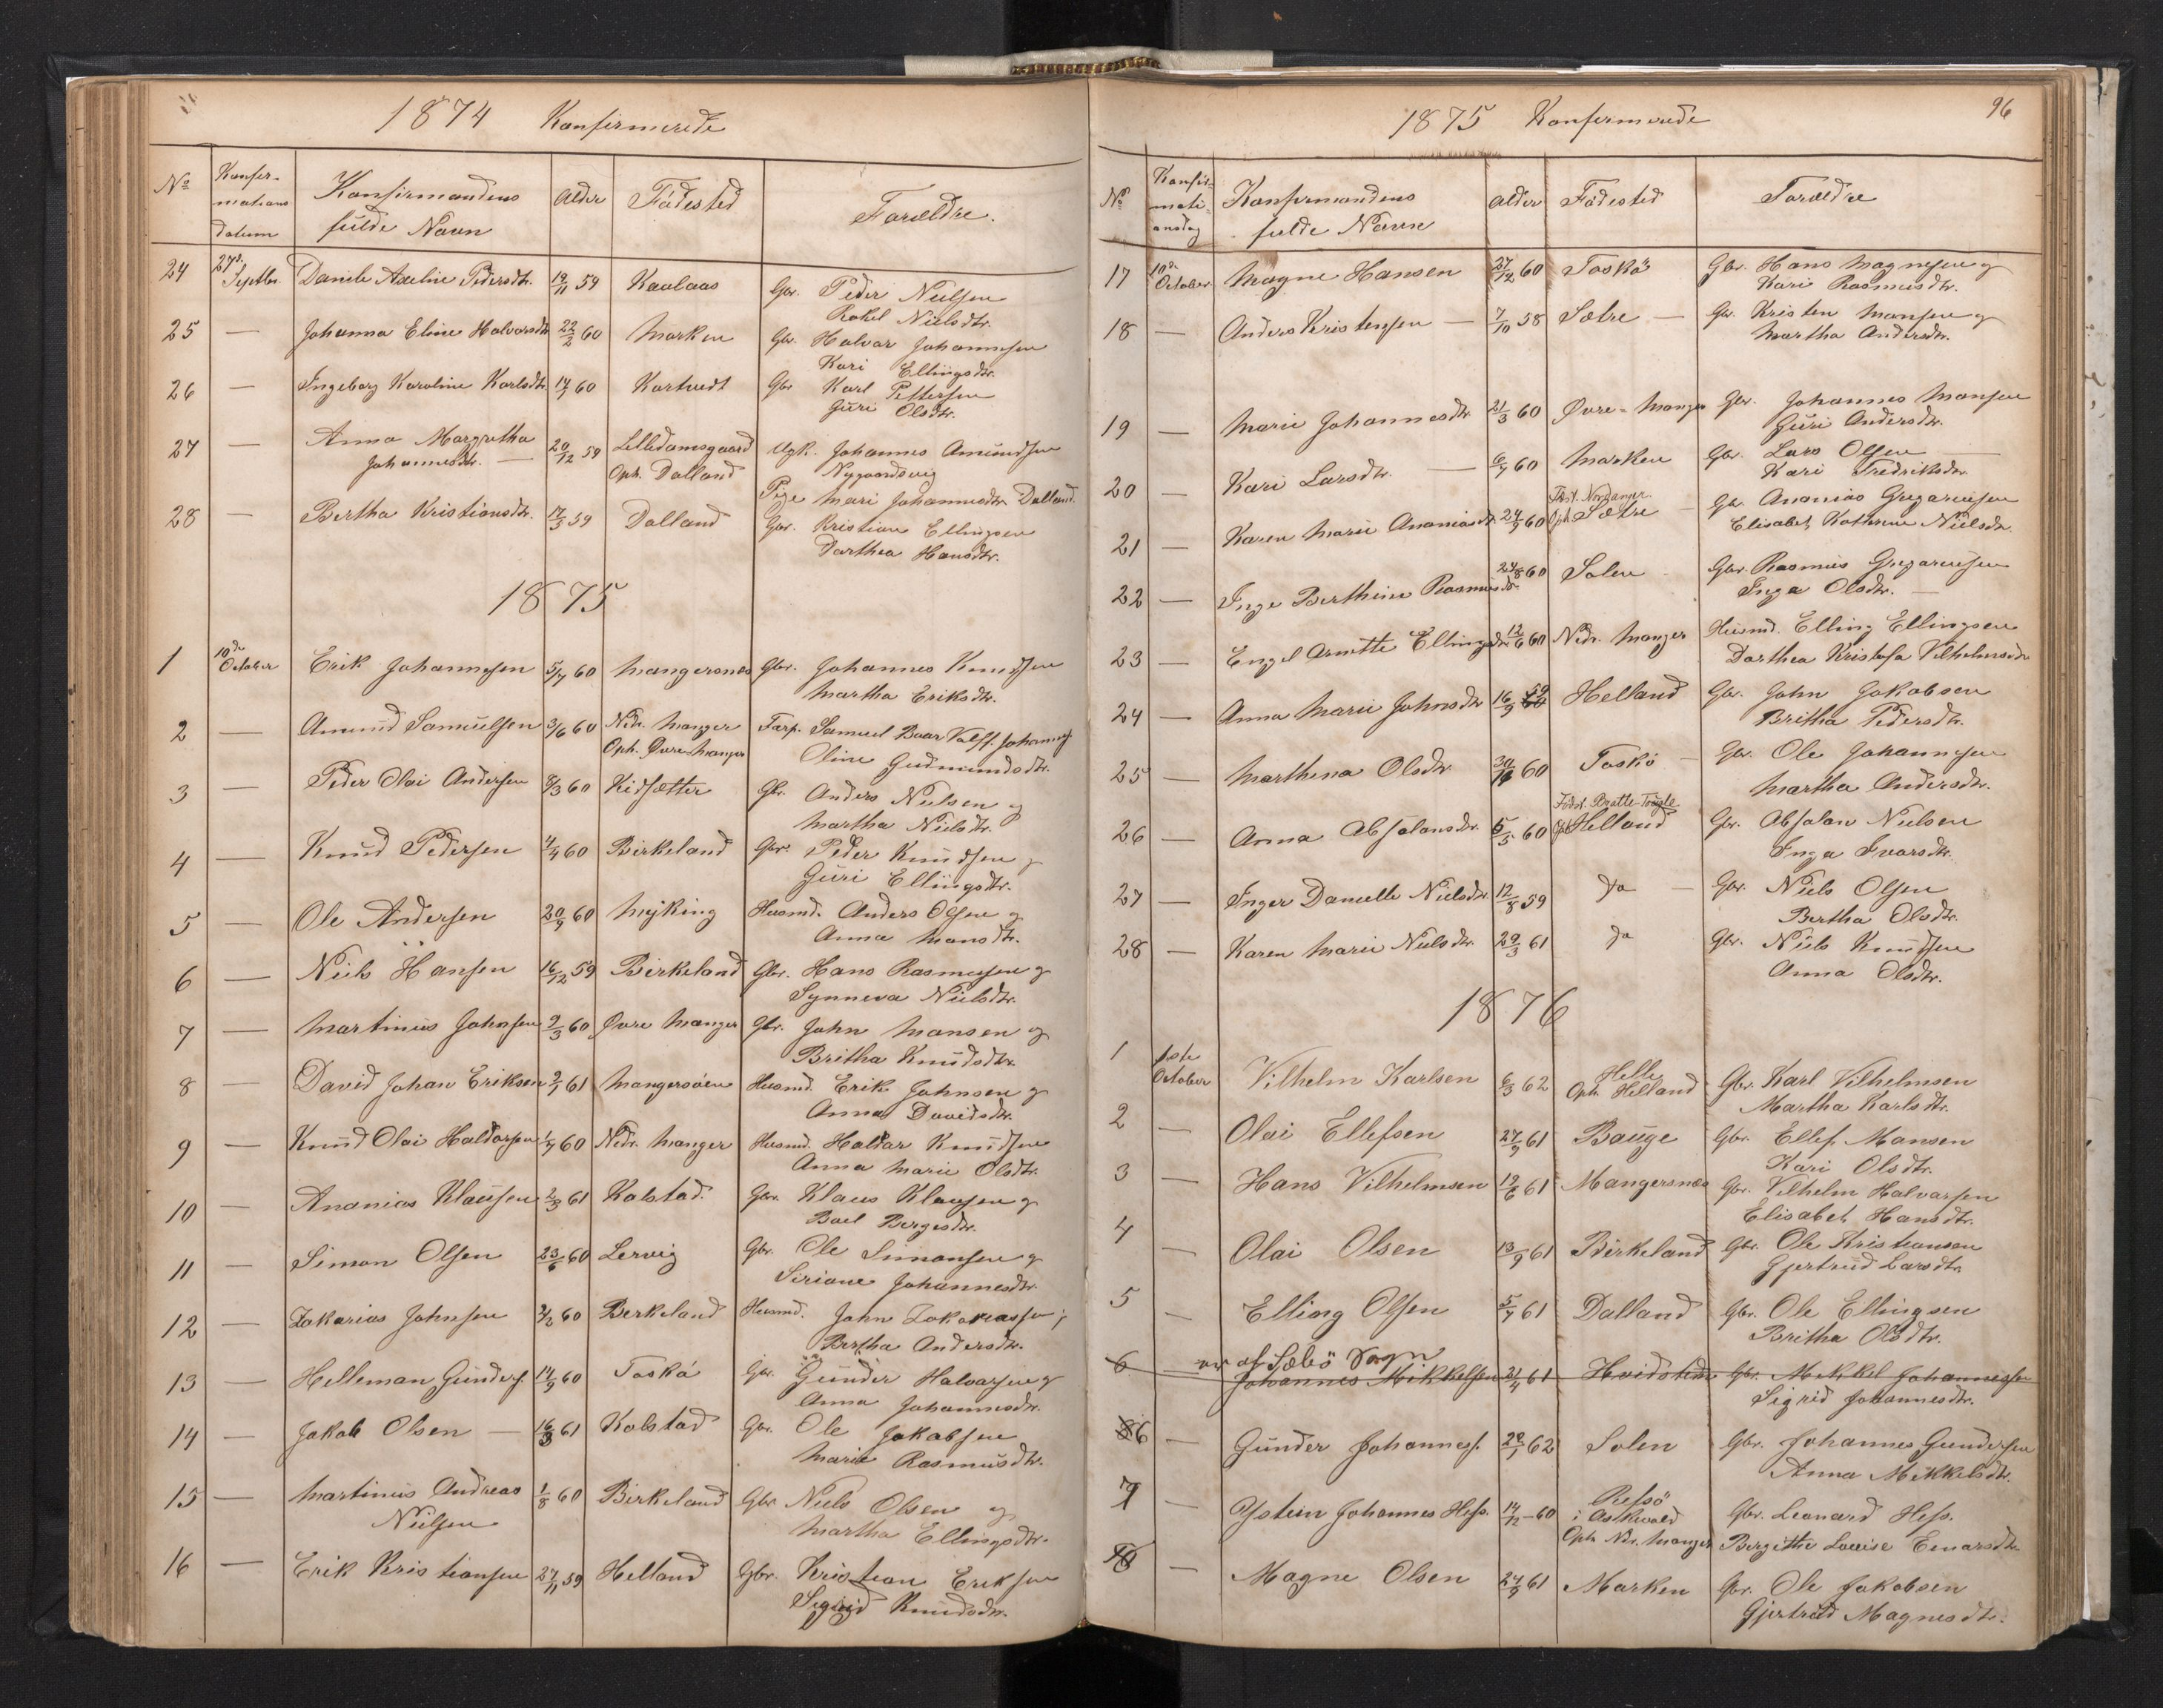 SAB, Manger sokneprestembete, H/Hab: Klokkerbok nr. A 1, 1874-1901, s. 95b-96a